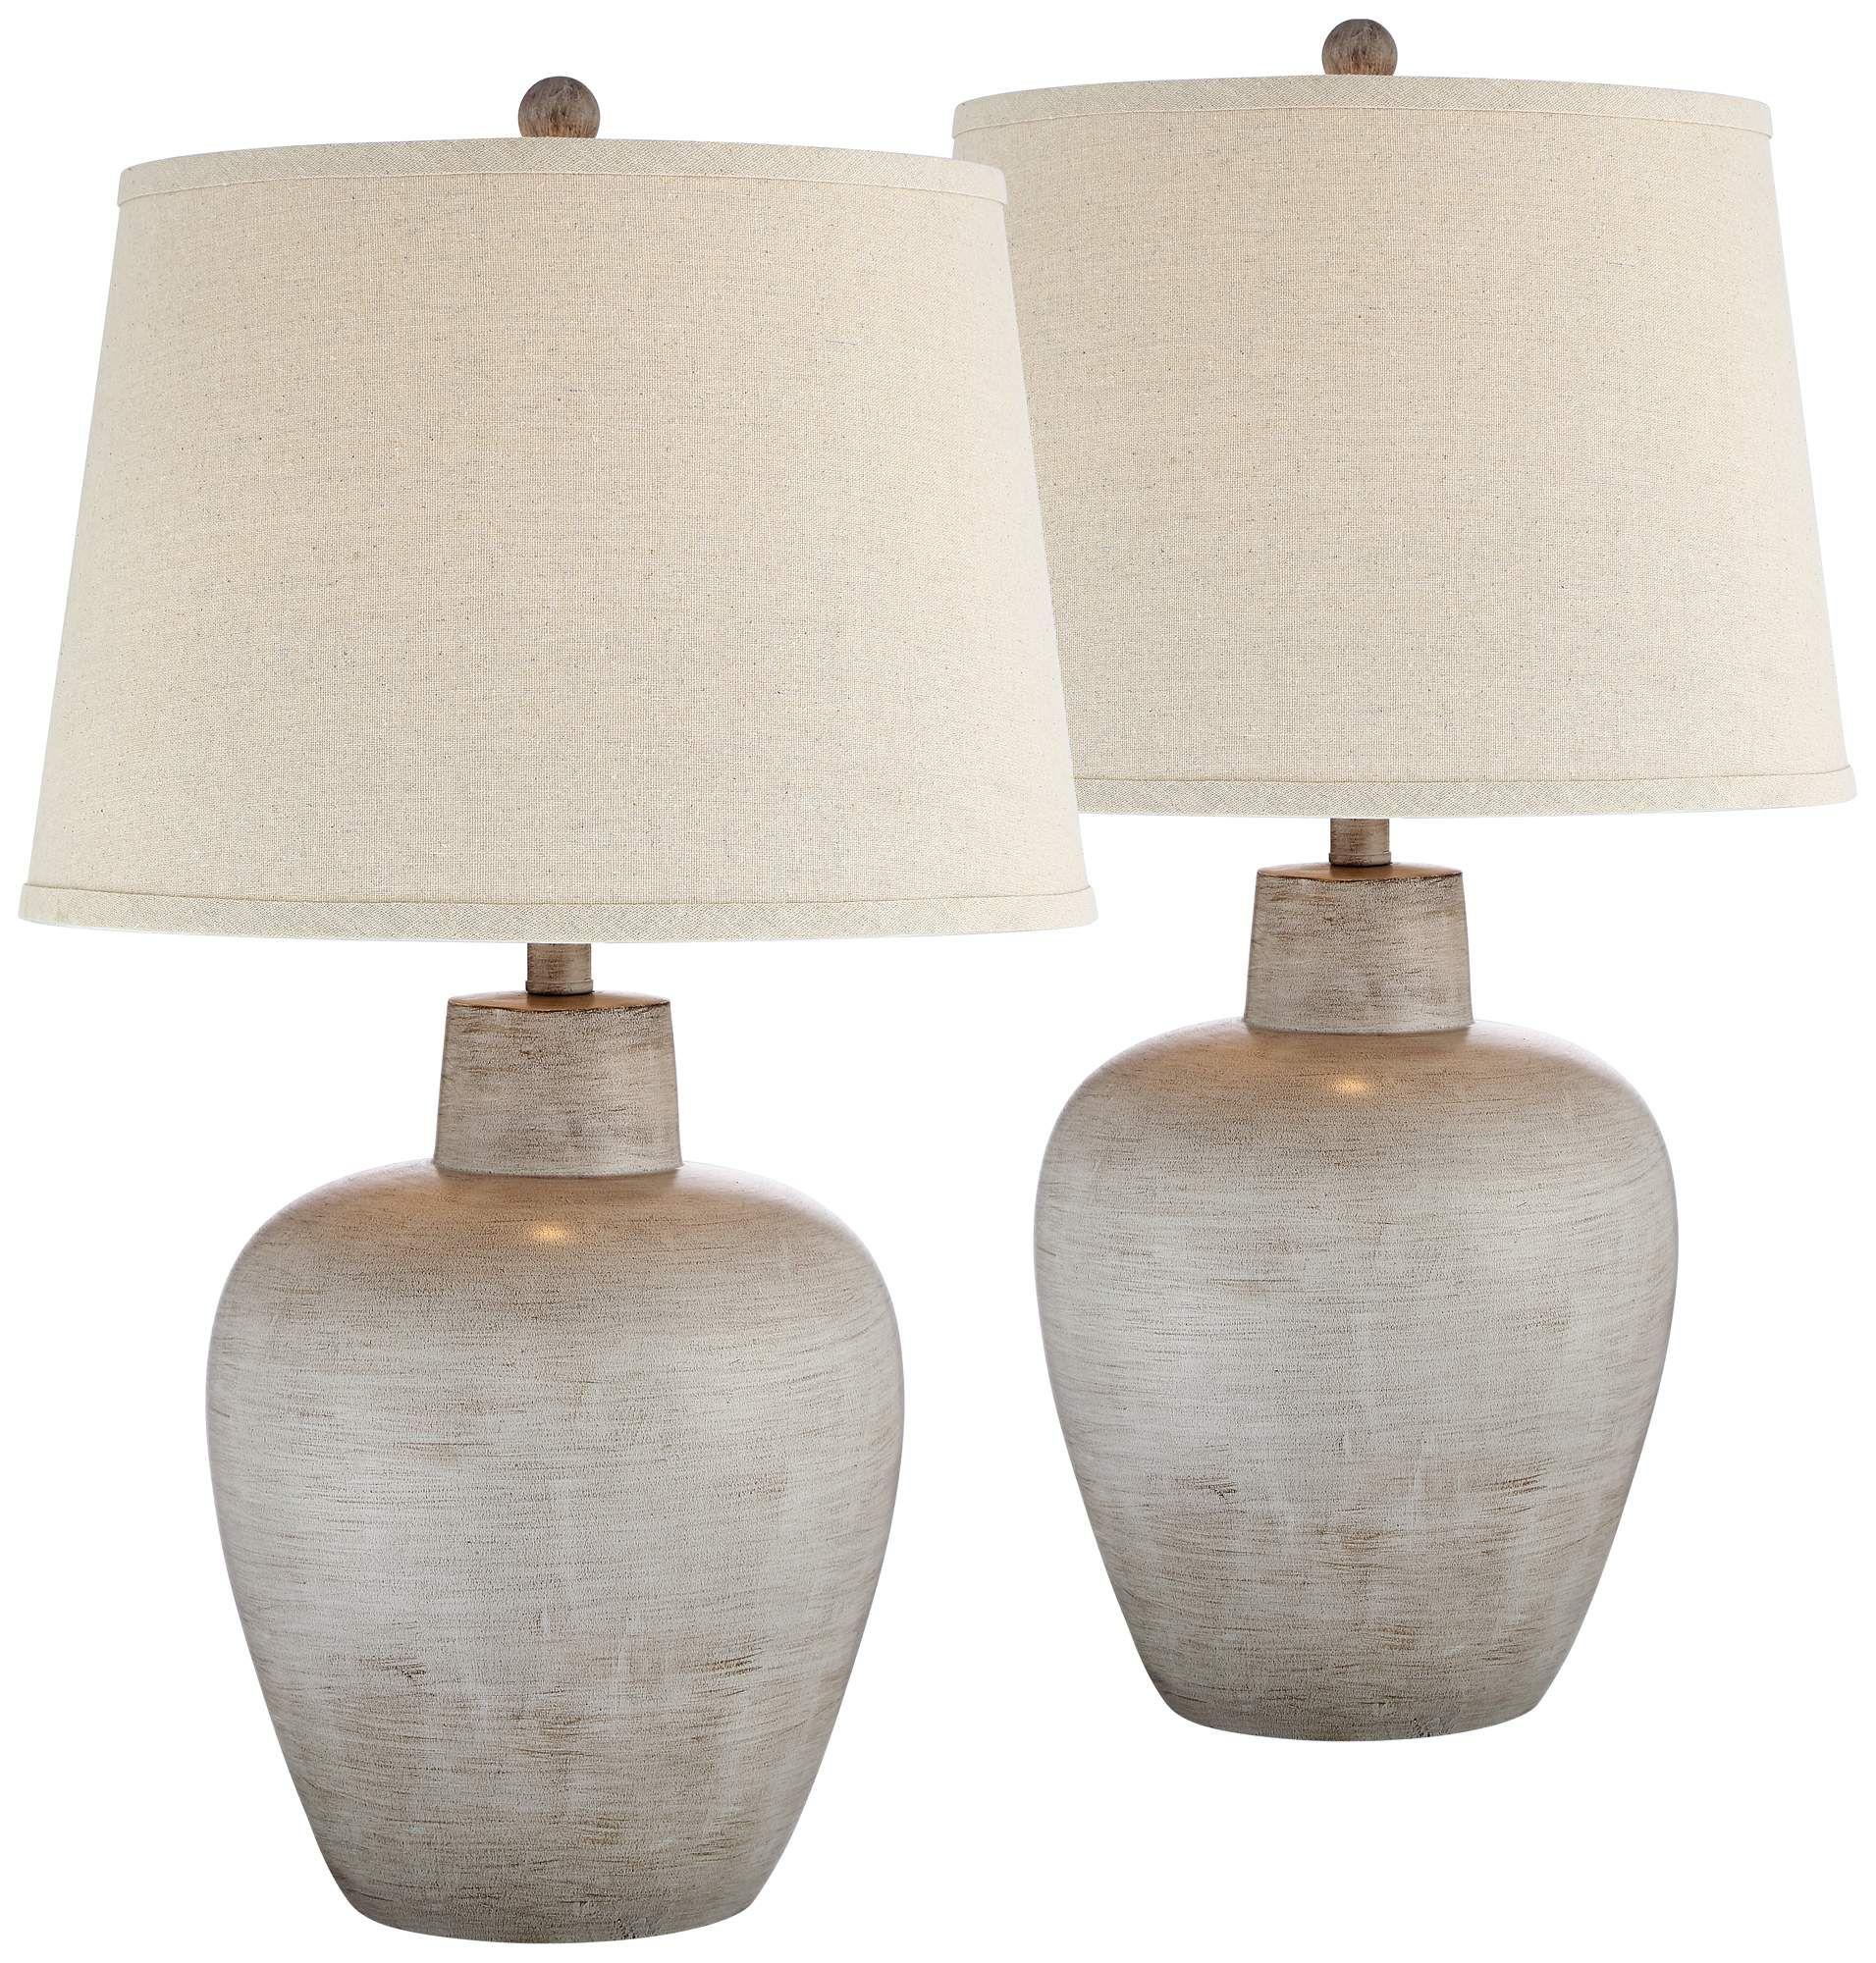 Glenn Southwest Urn Table Lamps Set Of 2 Lamp Sets Farmhouse Table Lamps Table Lamp Sets #table #lamp #sets #for #living #room